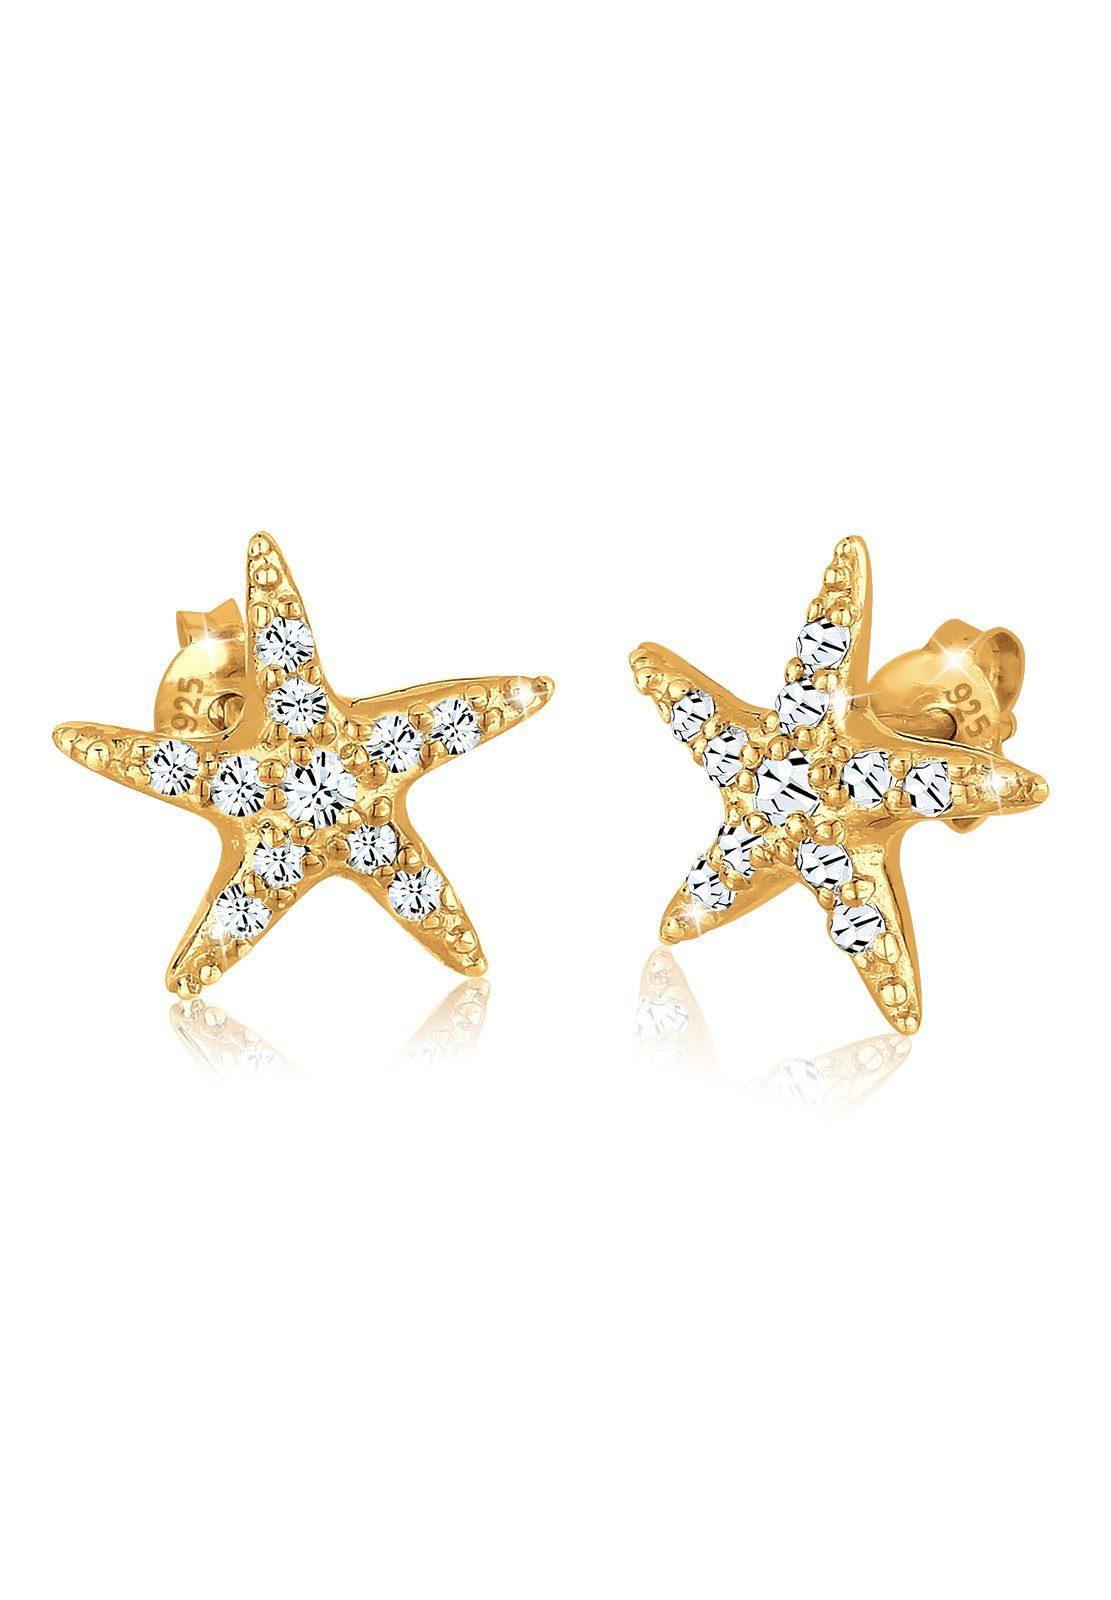 Elli Paar Ohrstecker »Seestern Swarovski® Kristalle 925 Silber vergoldet«